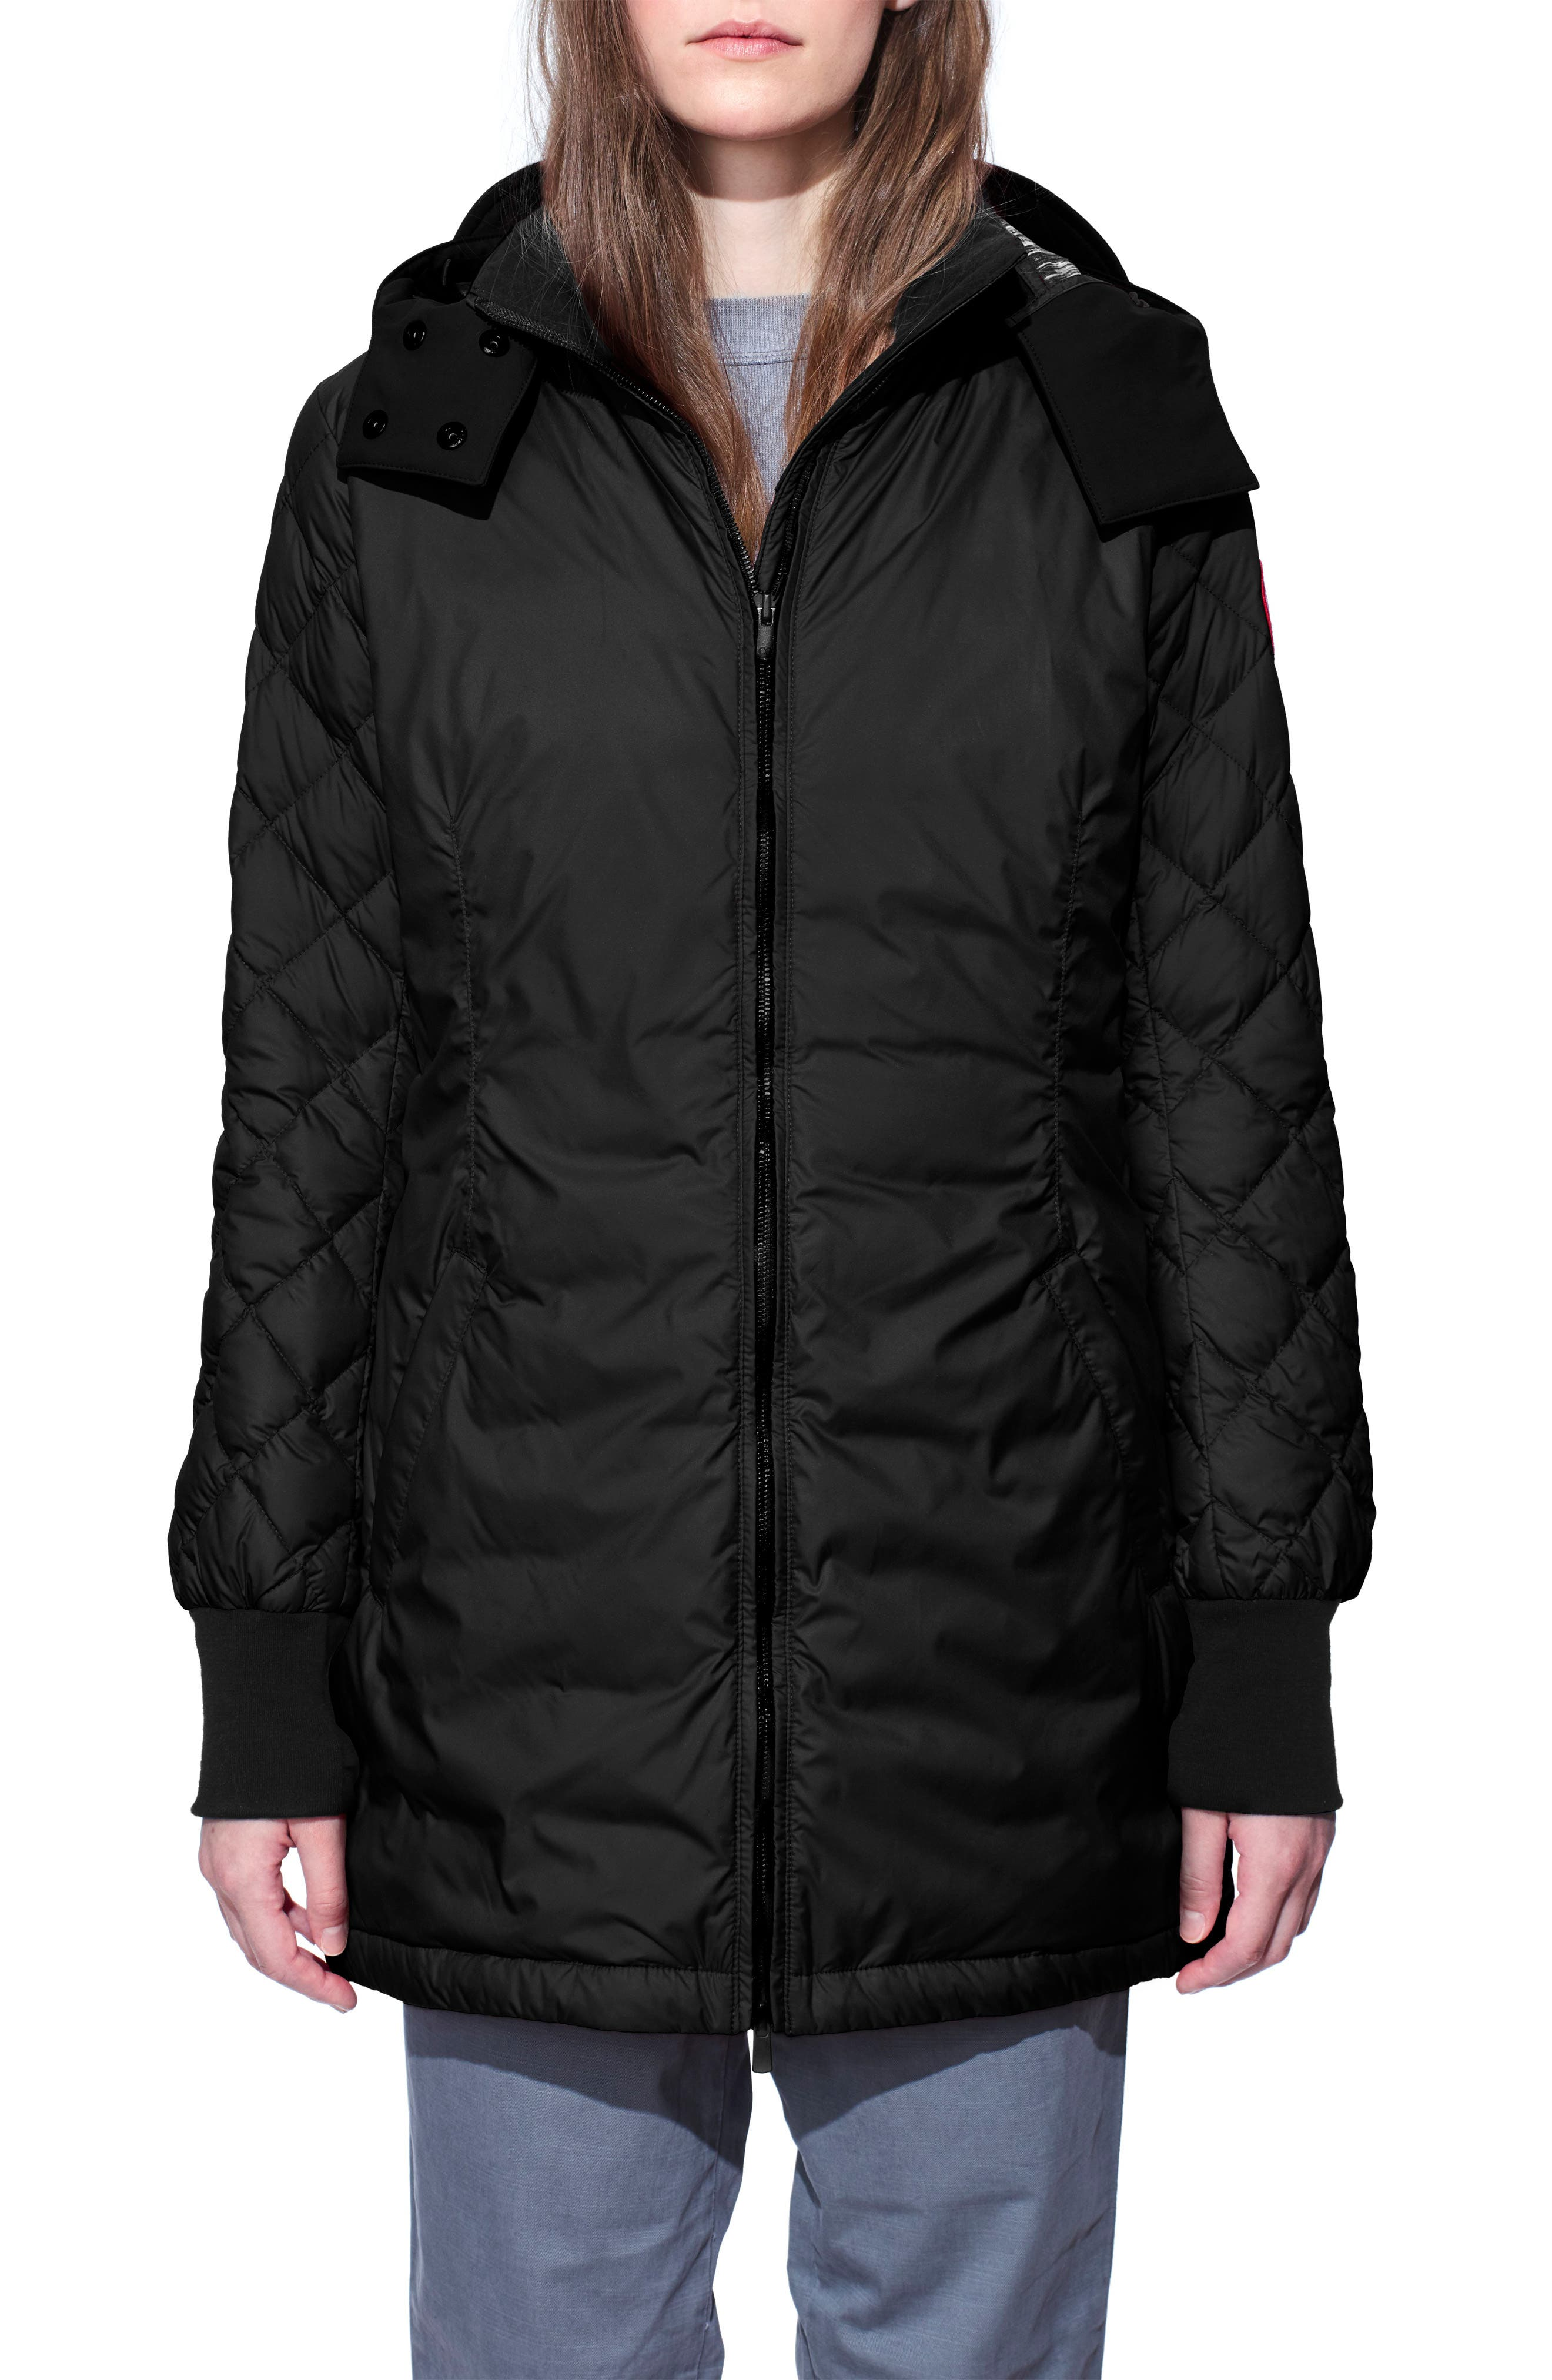 Stellarton Slim Fit Down Coat,                             Main thumbnail 1, color,                             Black/ Black